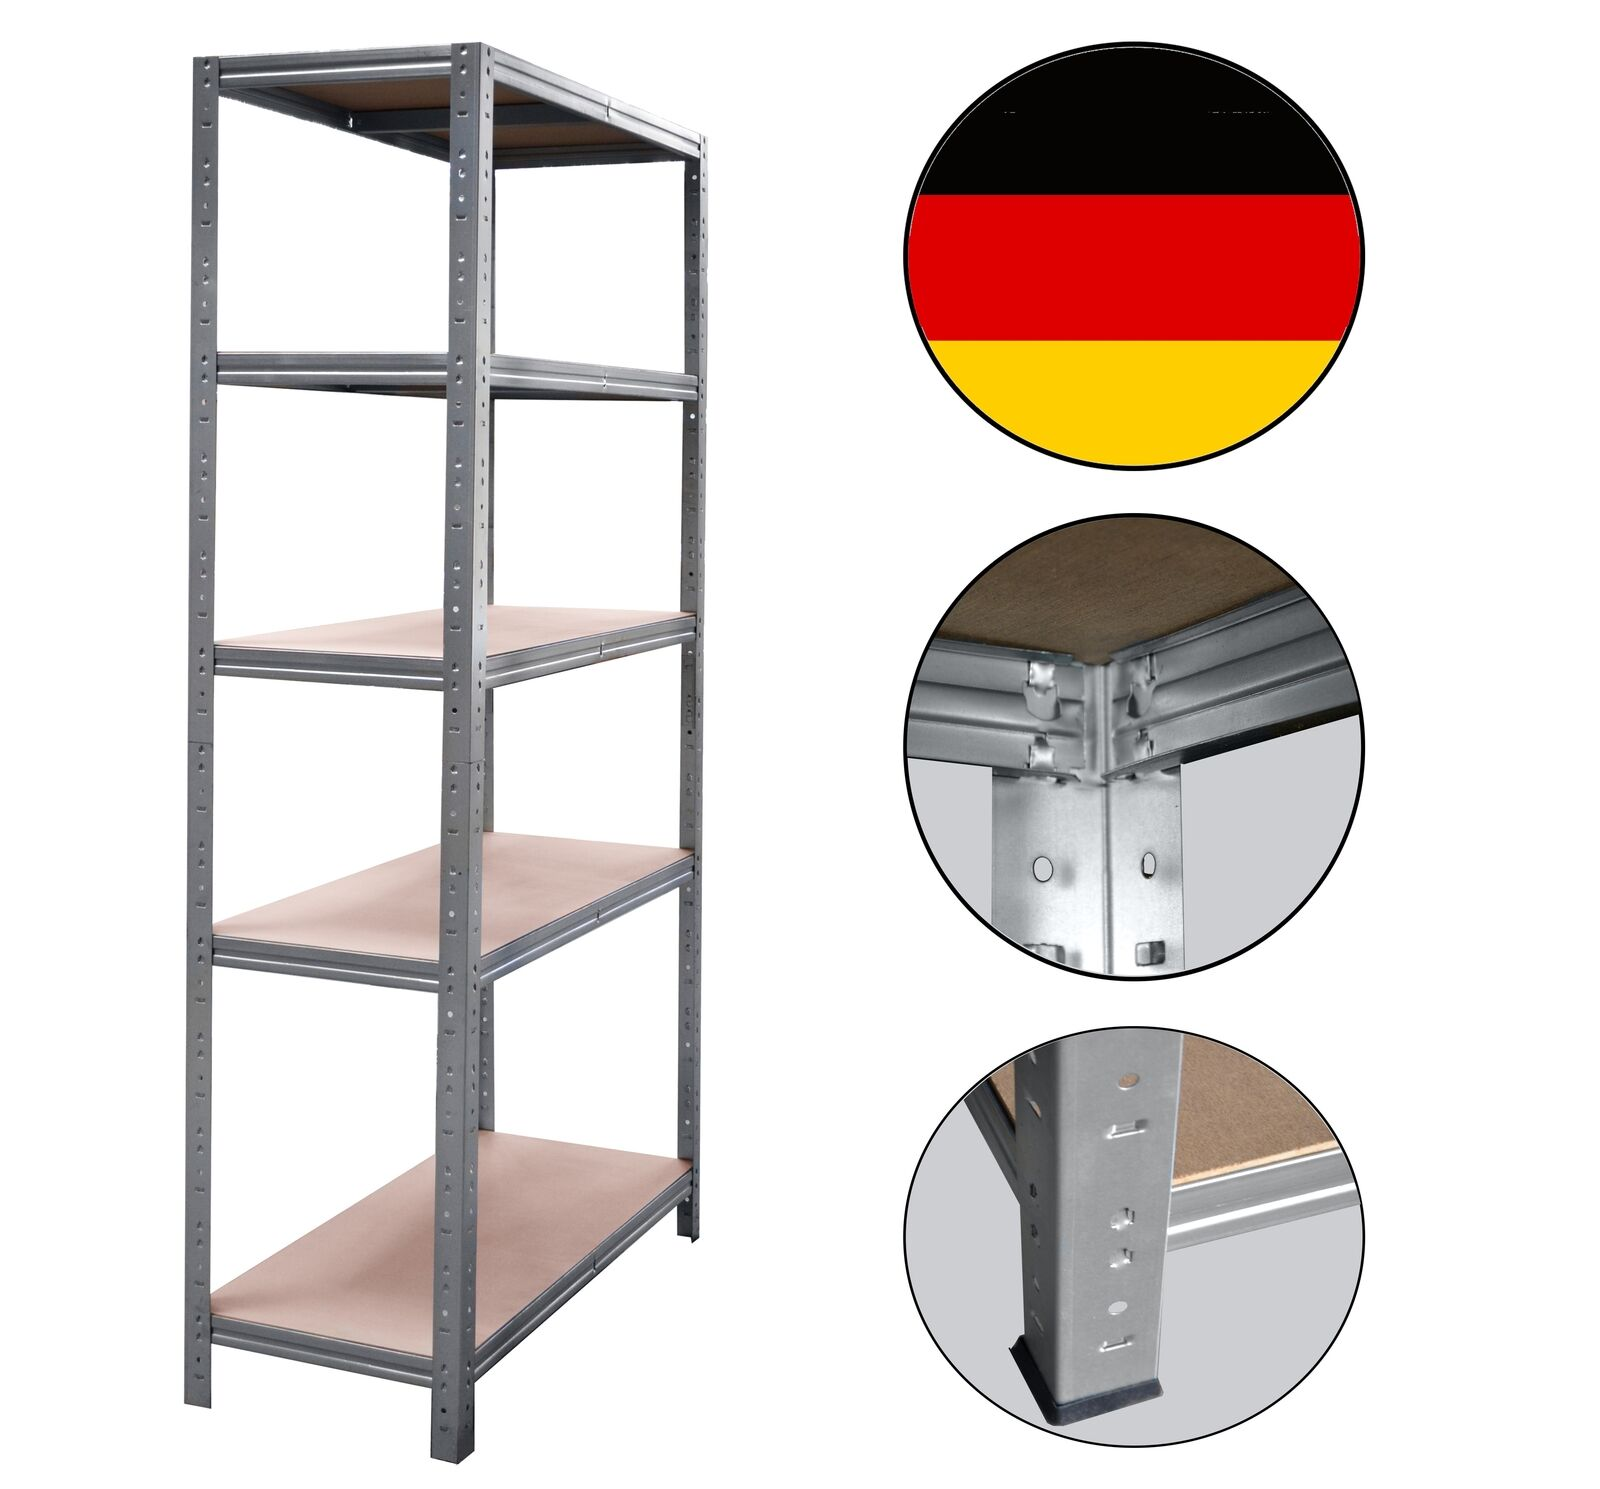 shelfplaza® PROFI Steckregal 230x150x40cm Akten Büro Garage Lager Werkstatt